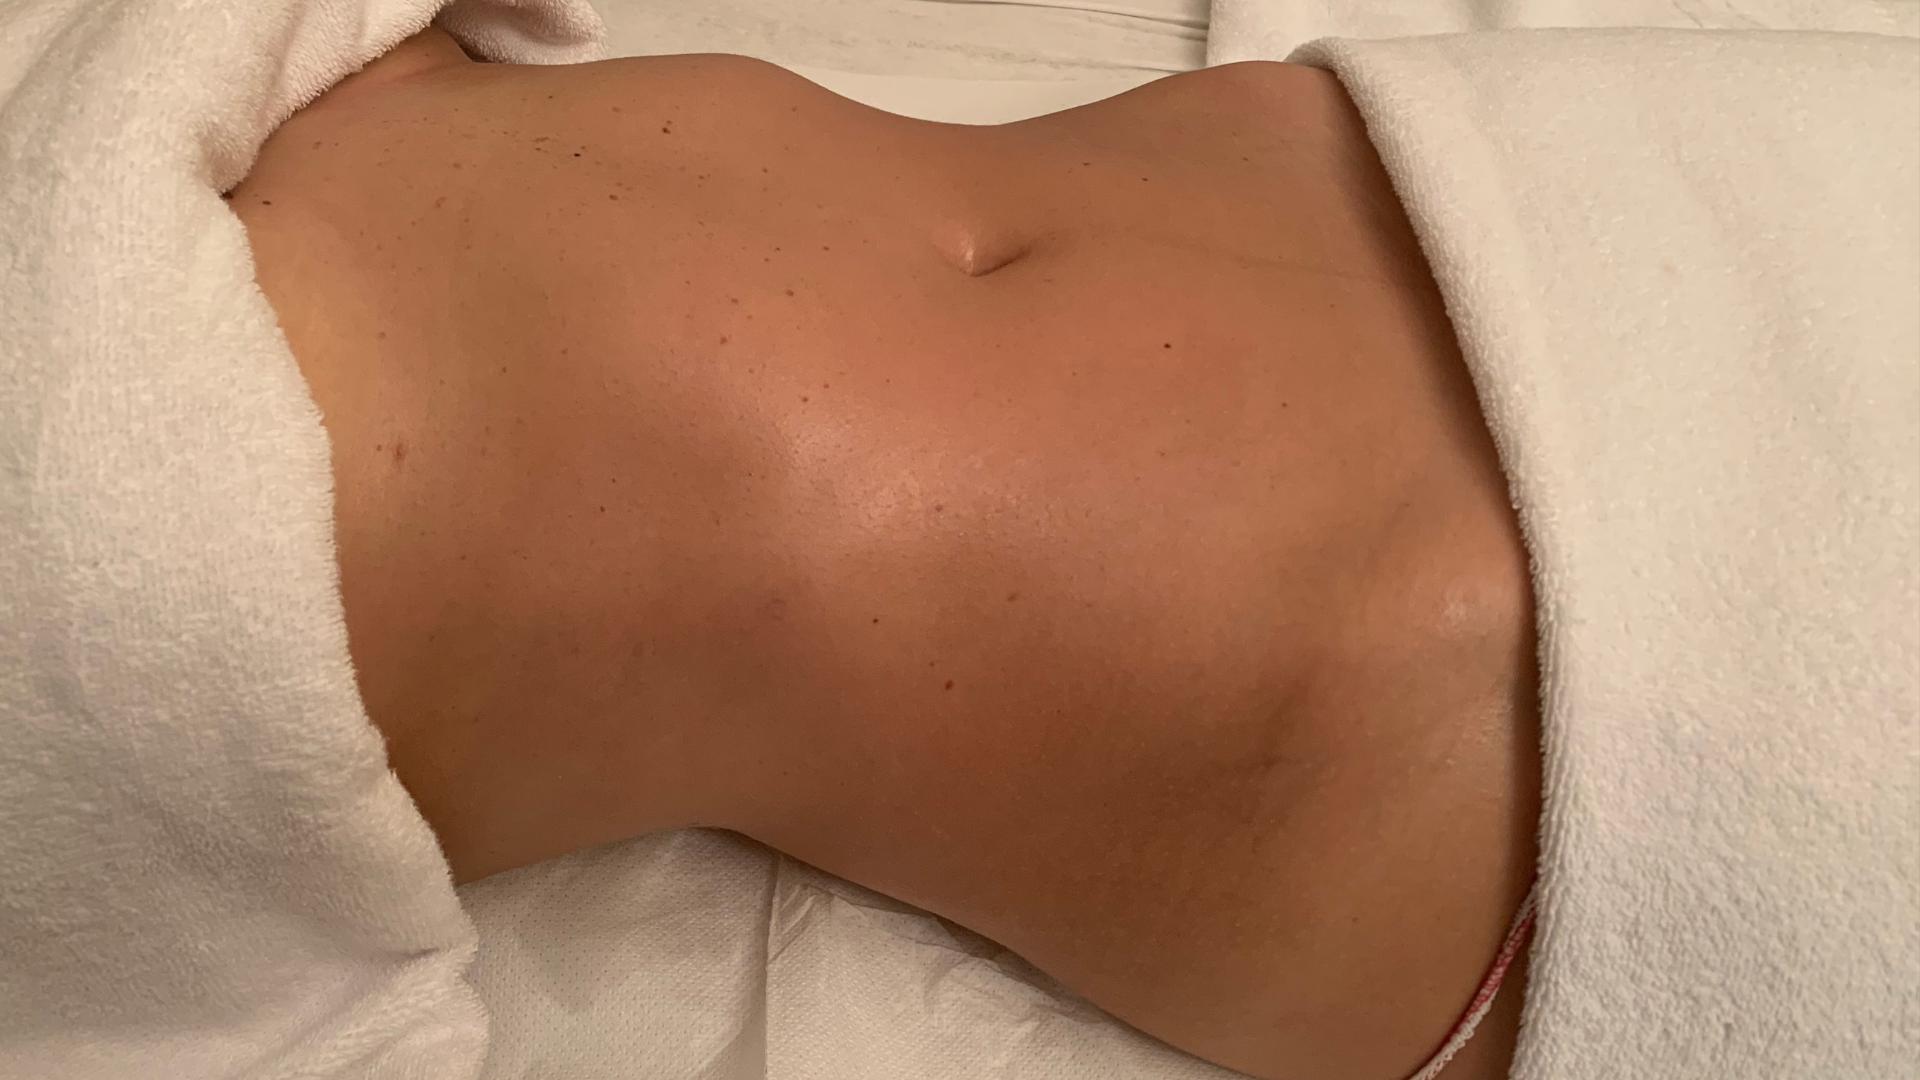 https://www.adec.it/le-nostre-specialita/smagliature-cicatrici-biodermogenesi-milano/